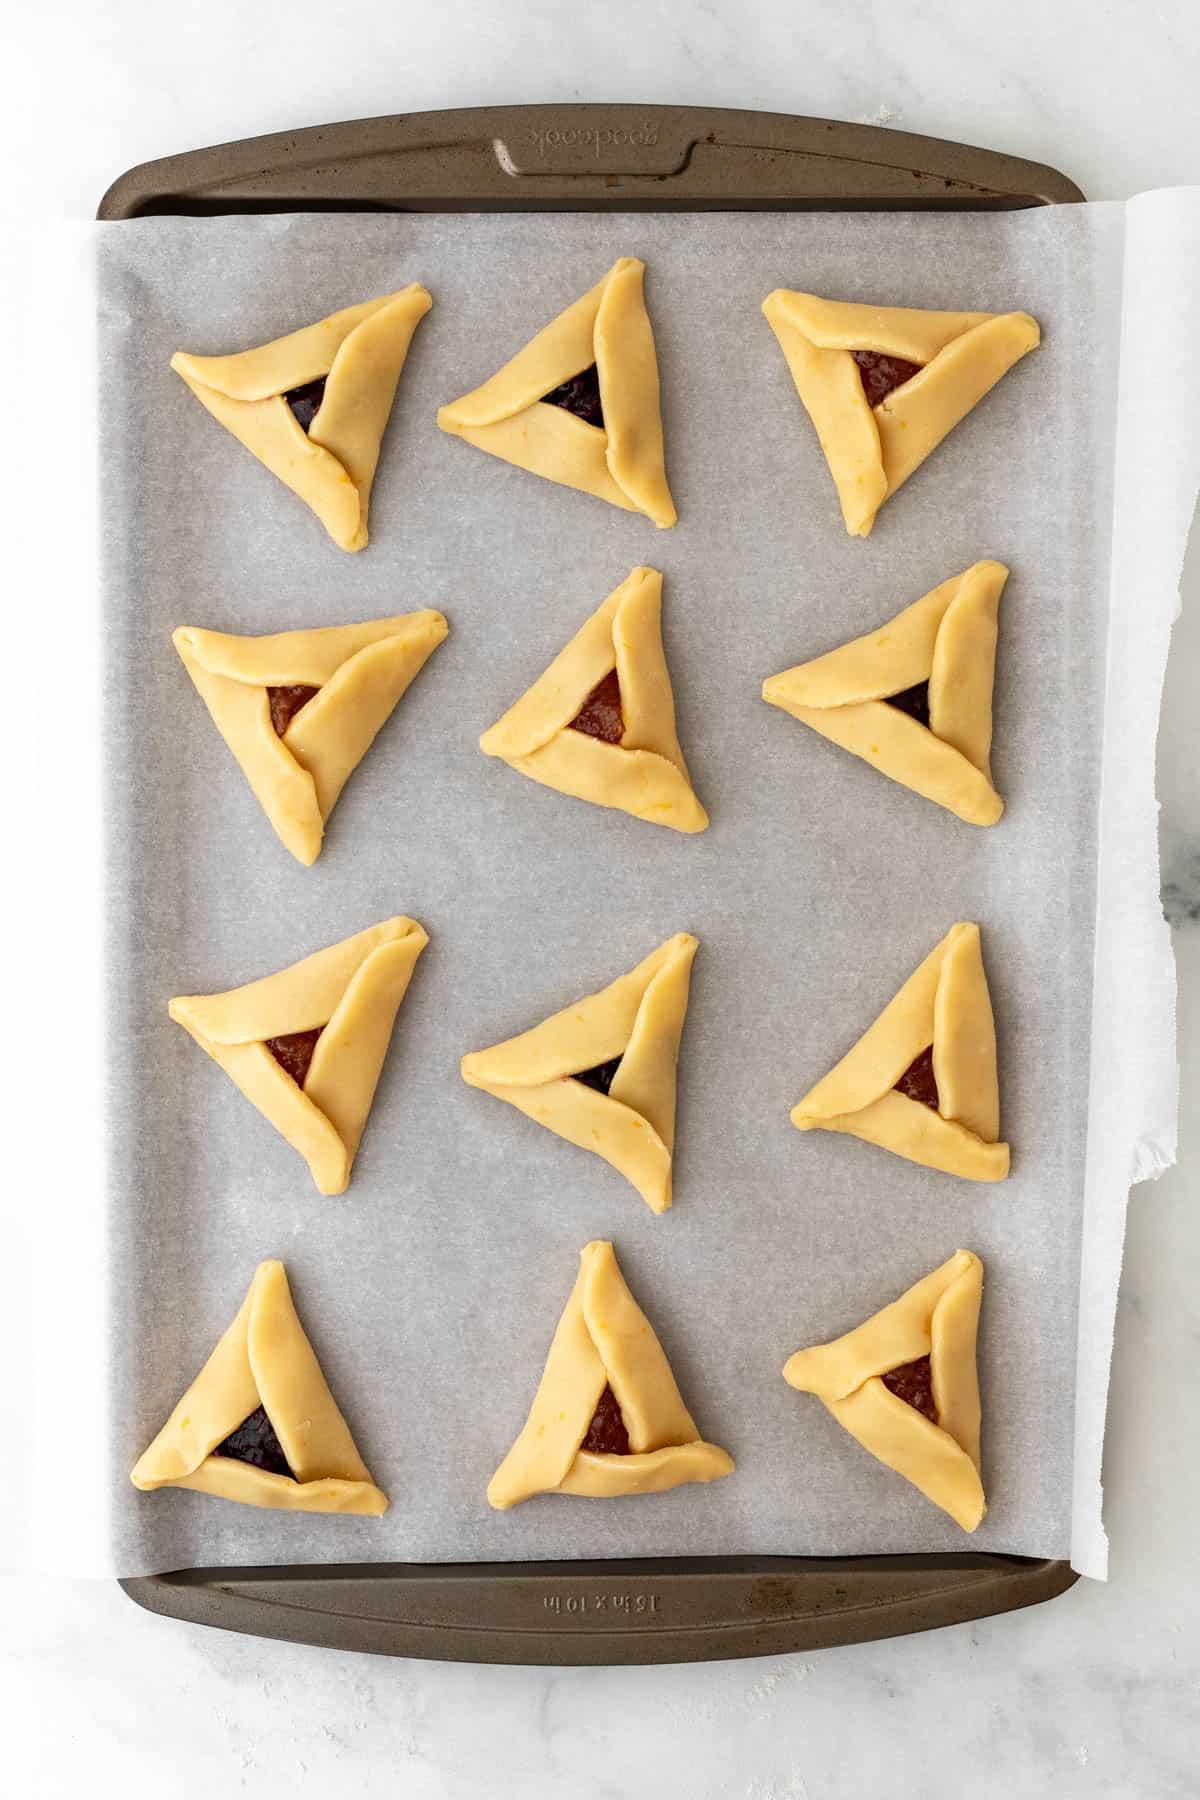 Raw hamantaschen on a cookie sheet.